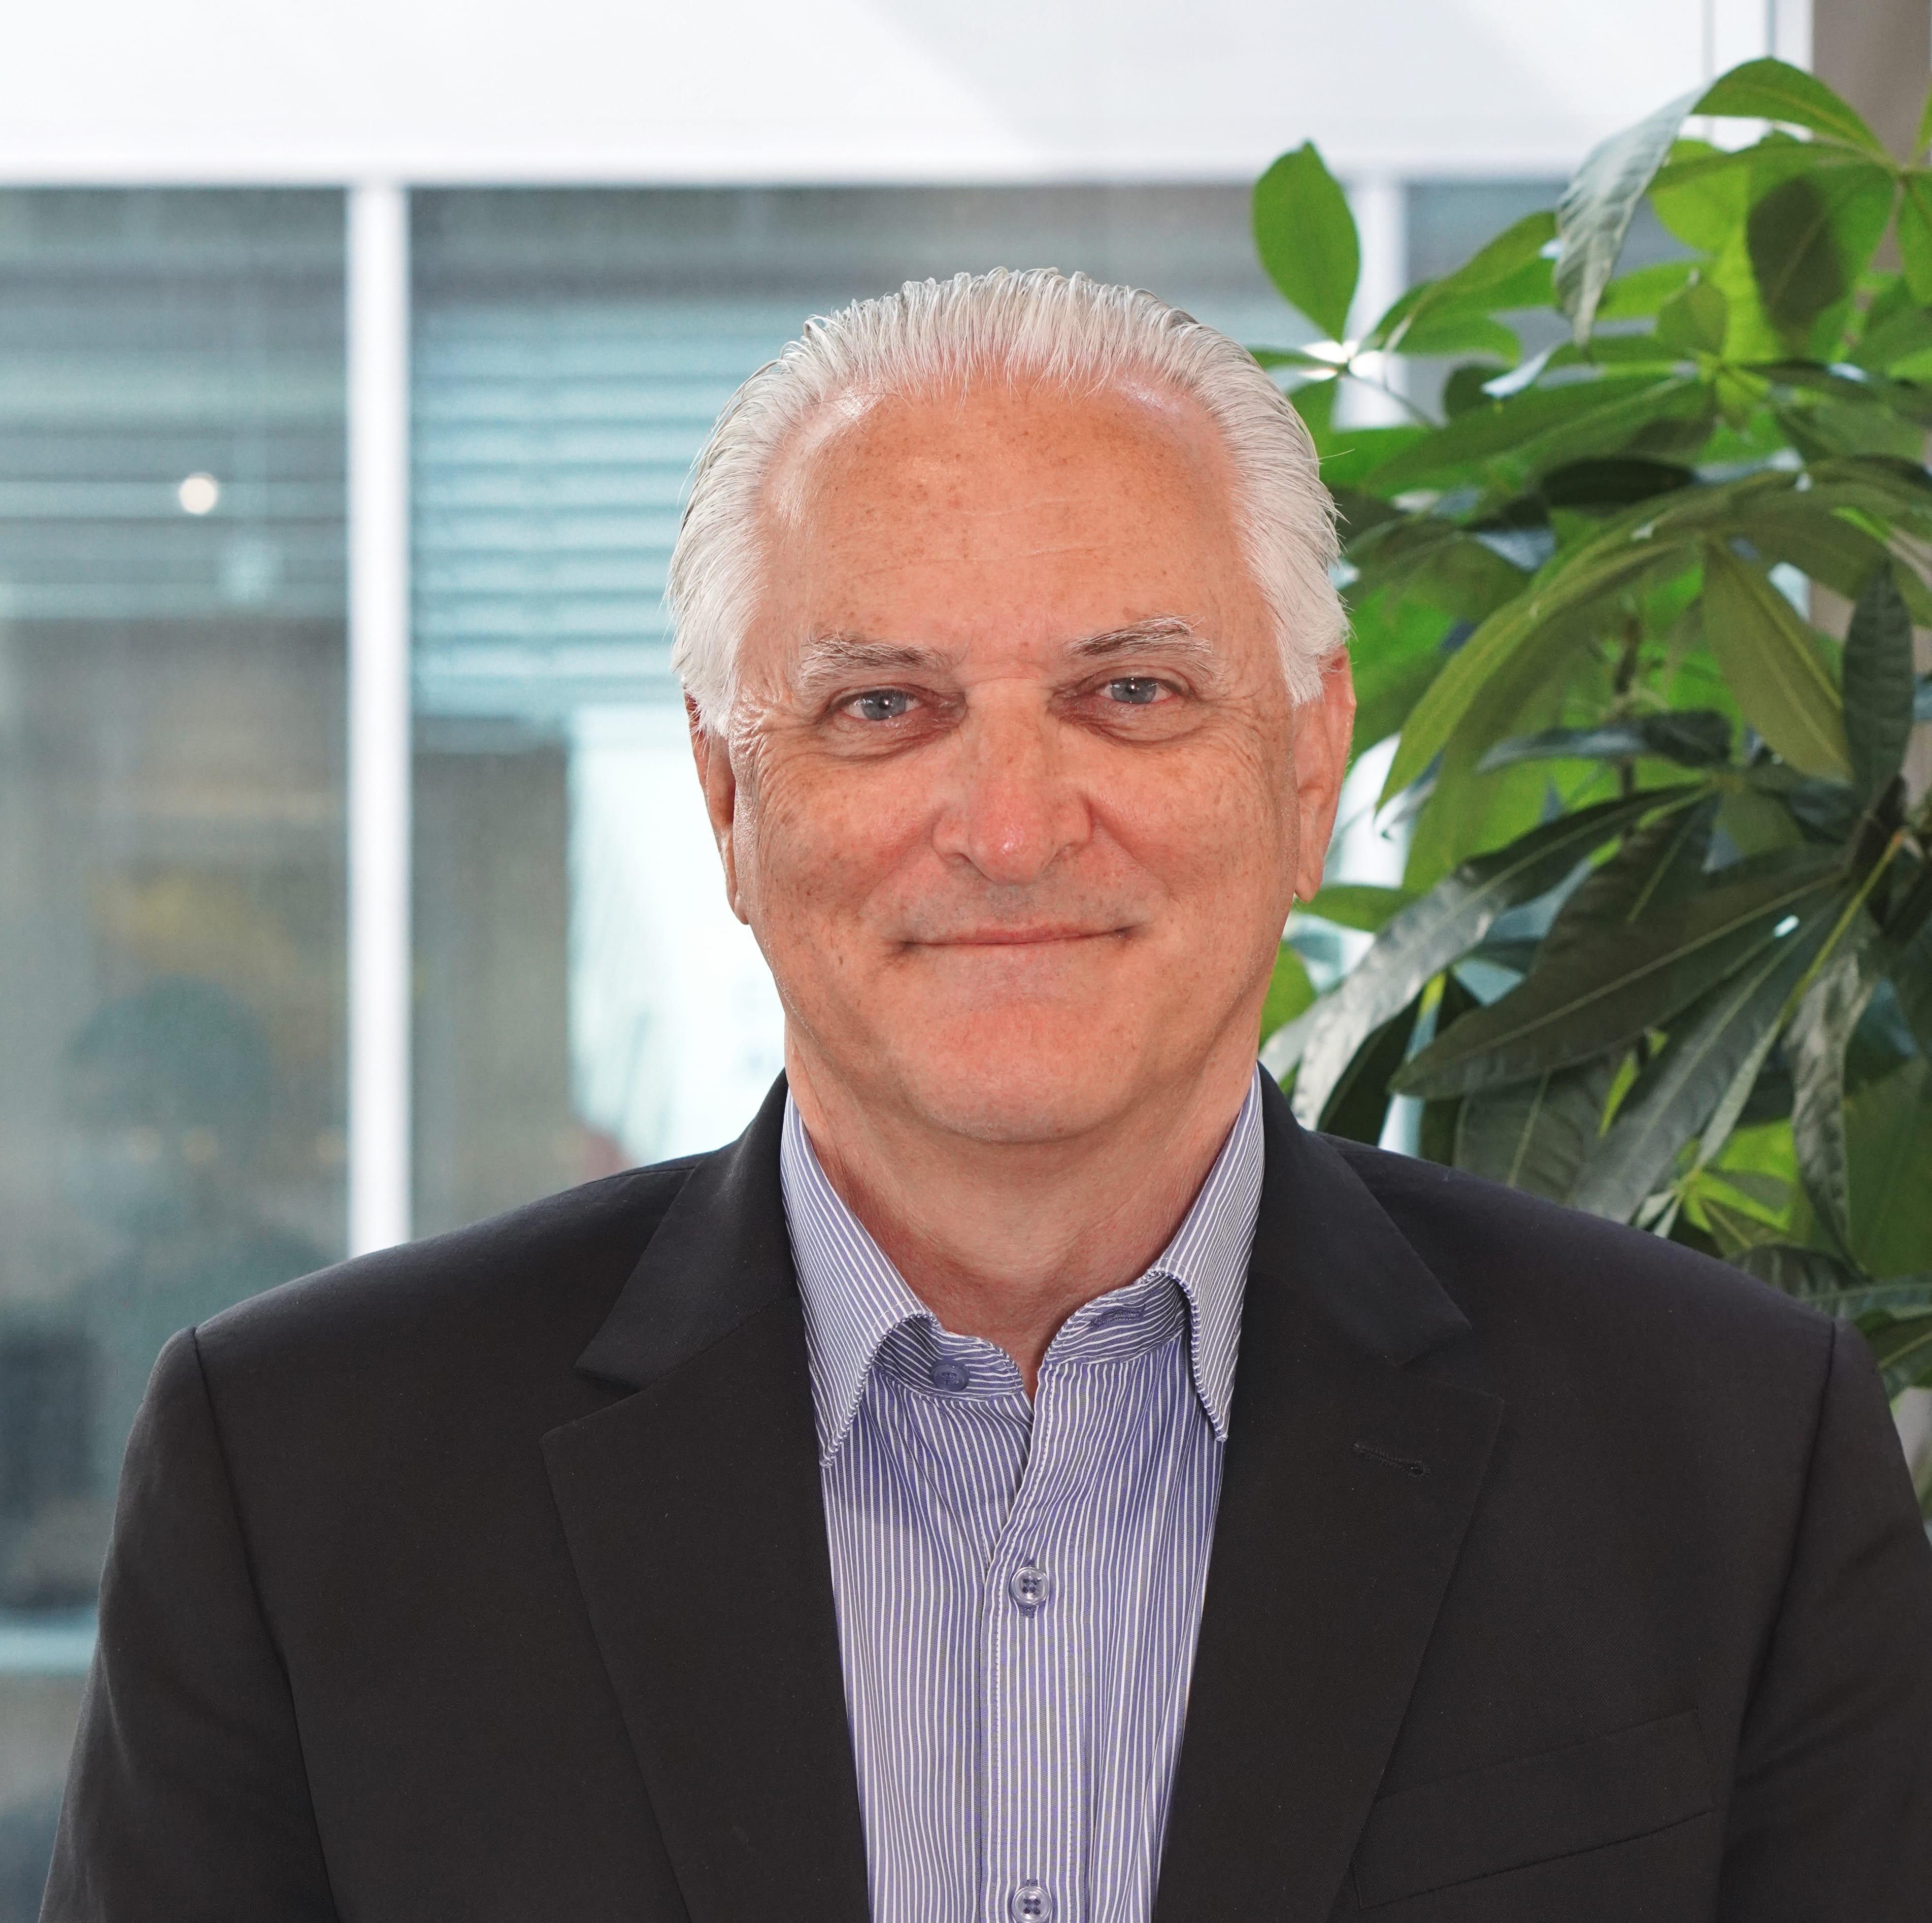 Dr. Michael Failer